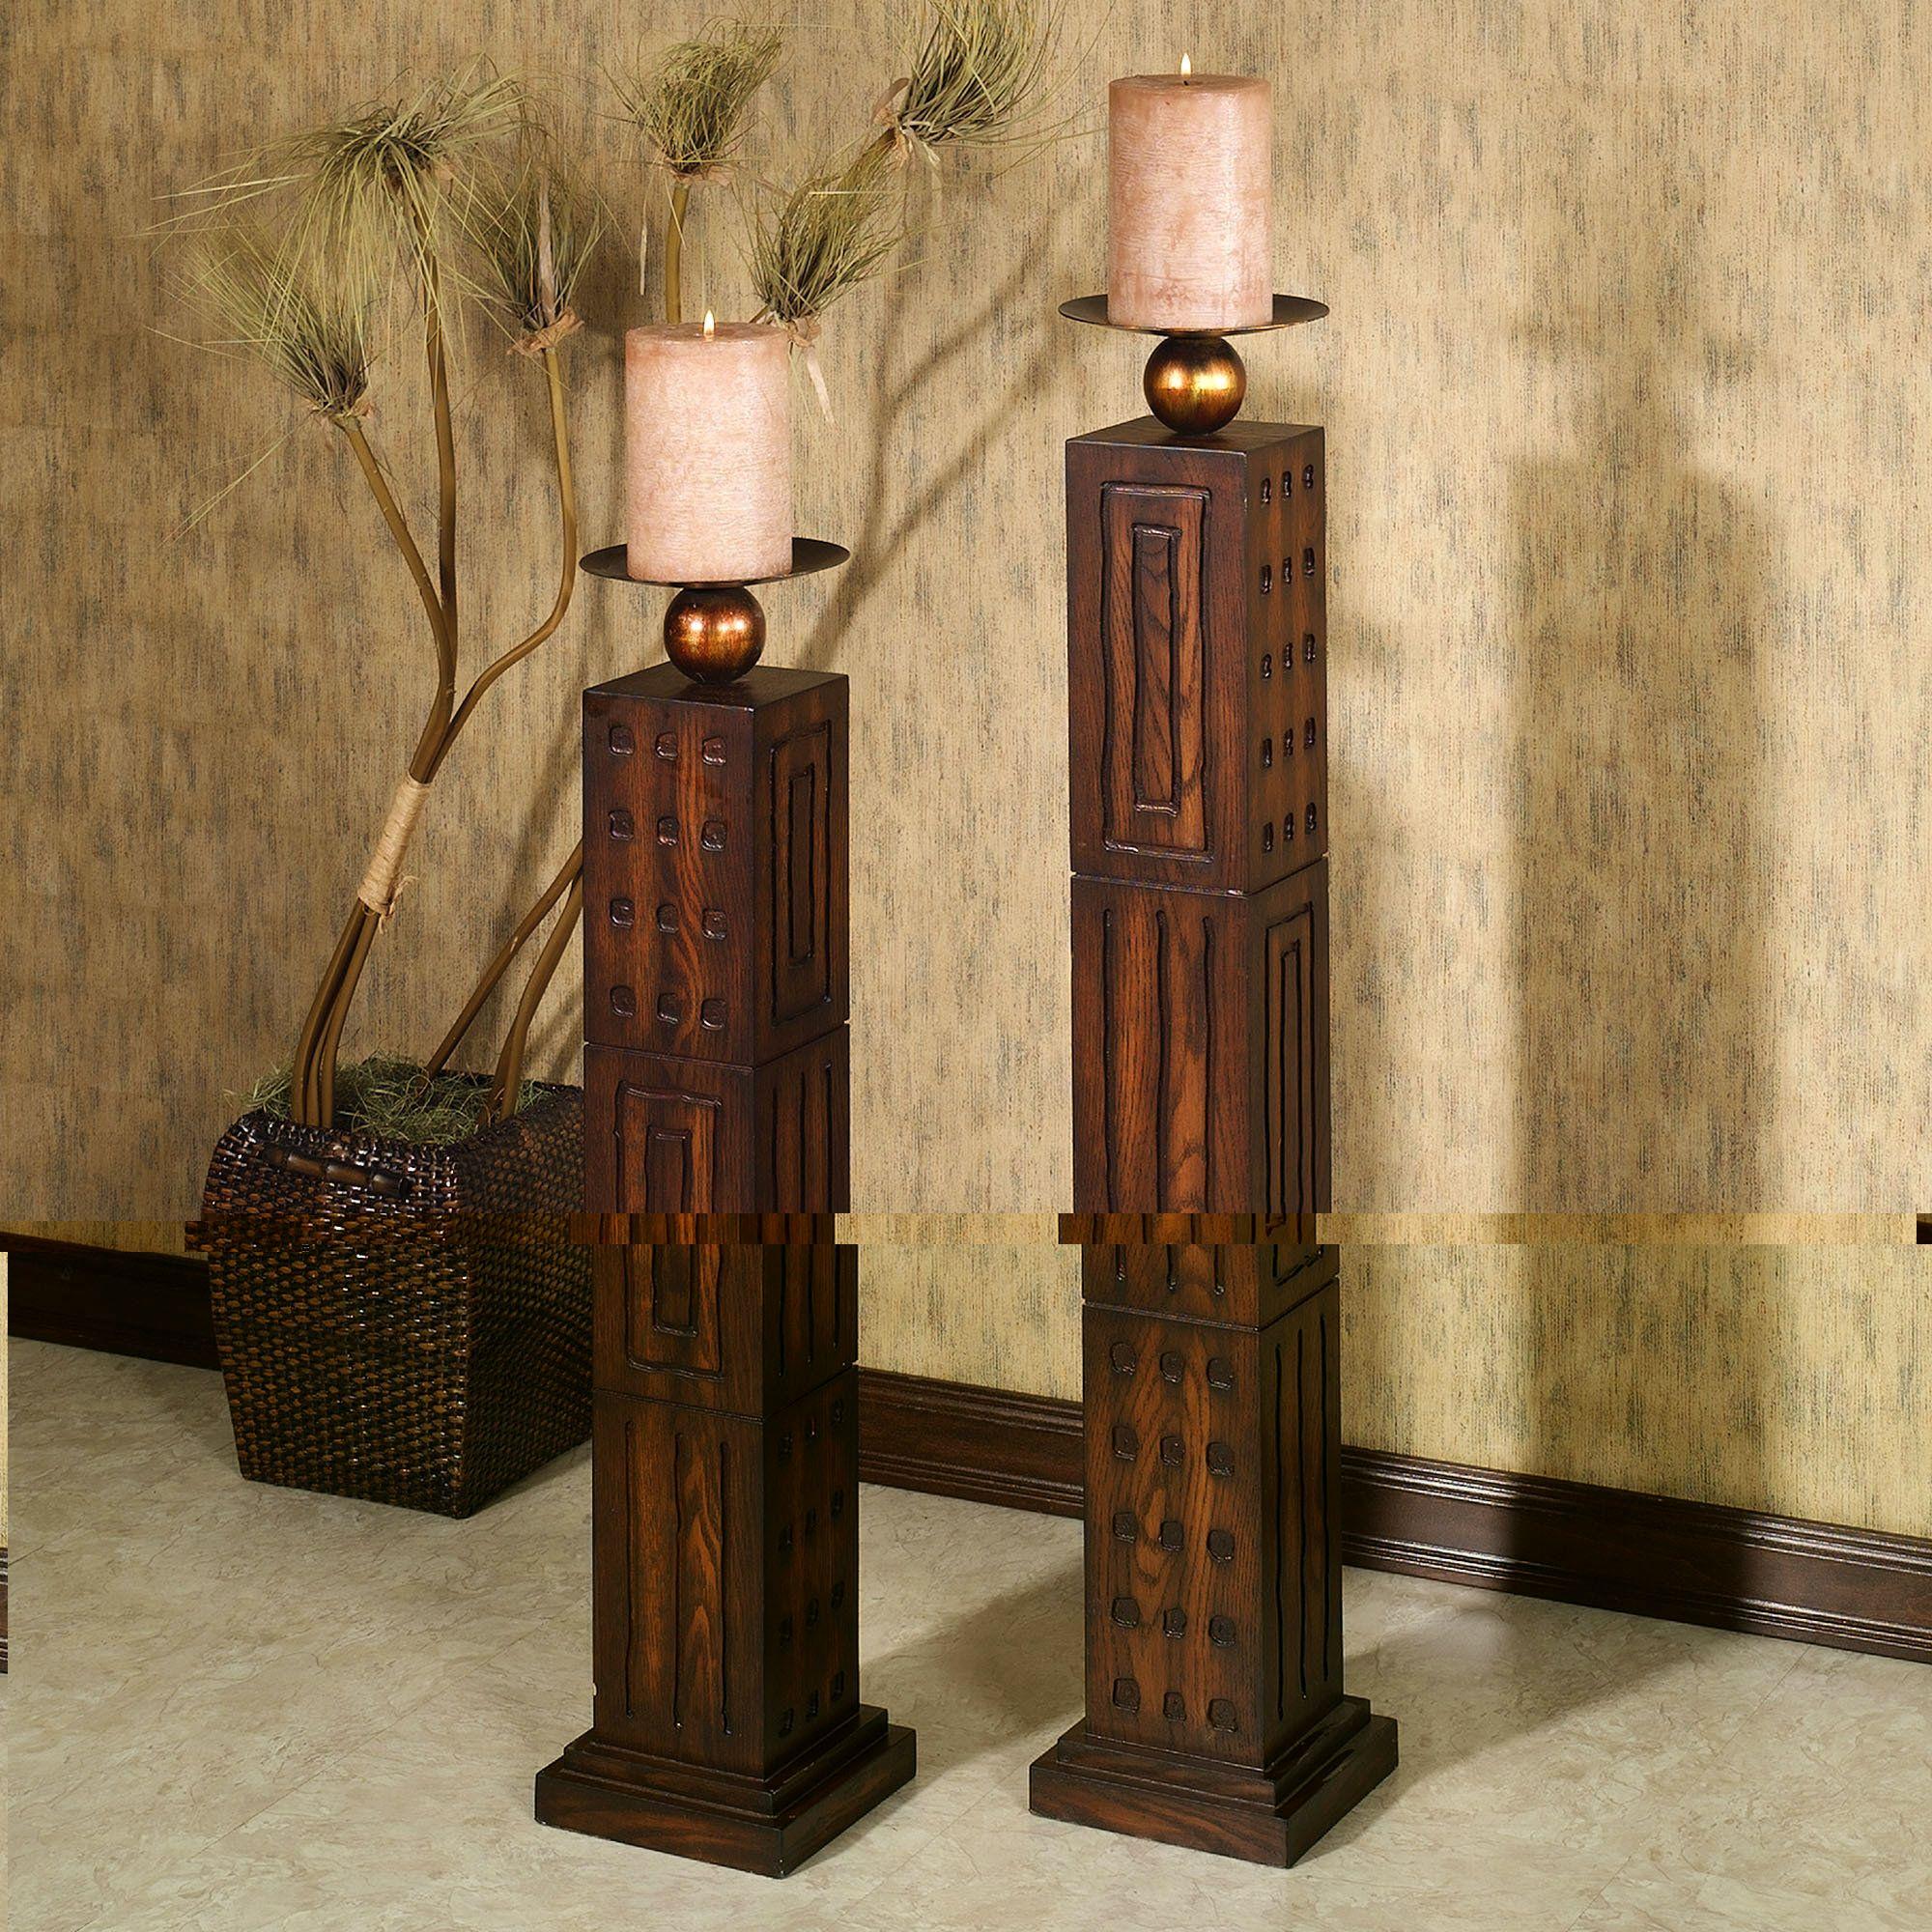 Wagner Floor Candleholder Set | Interior Design Projects ...